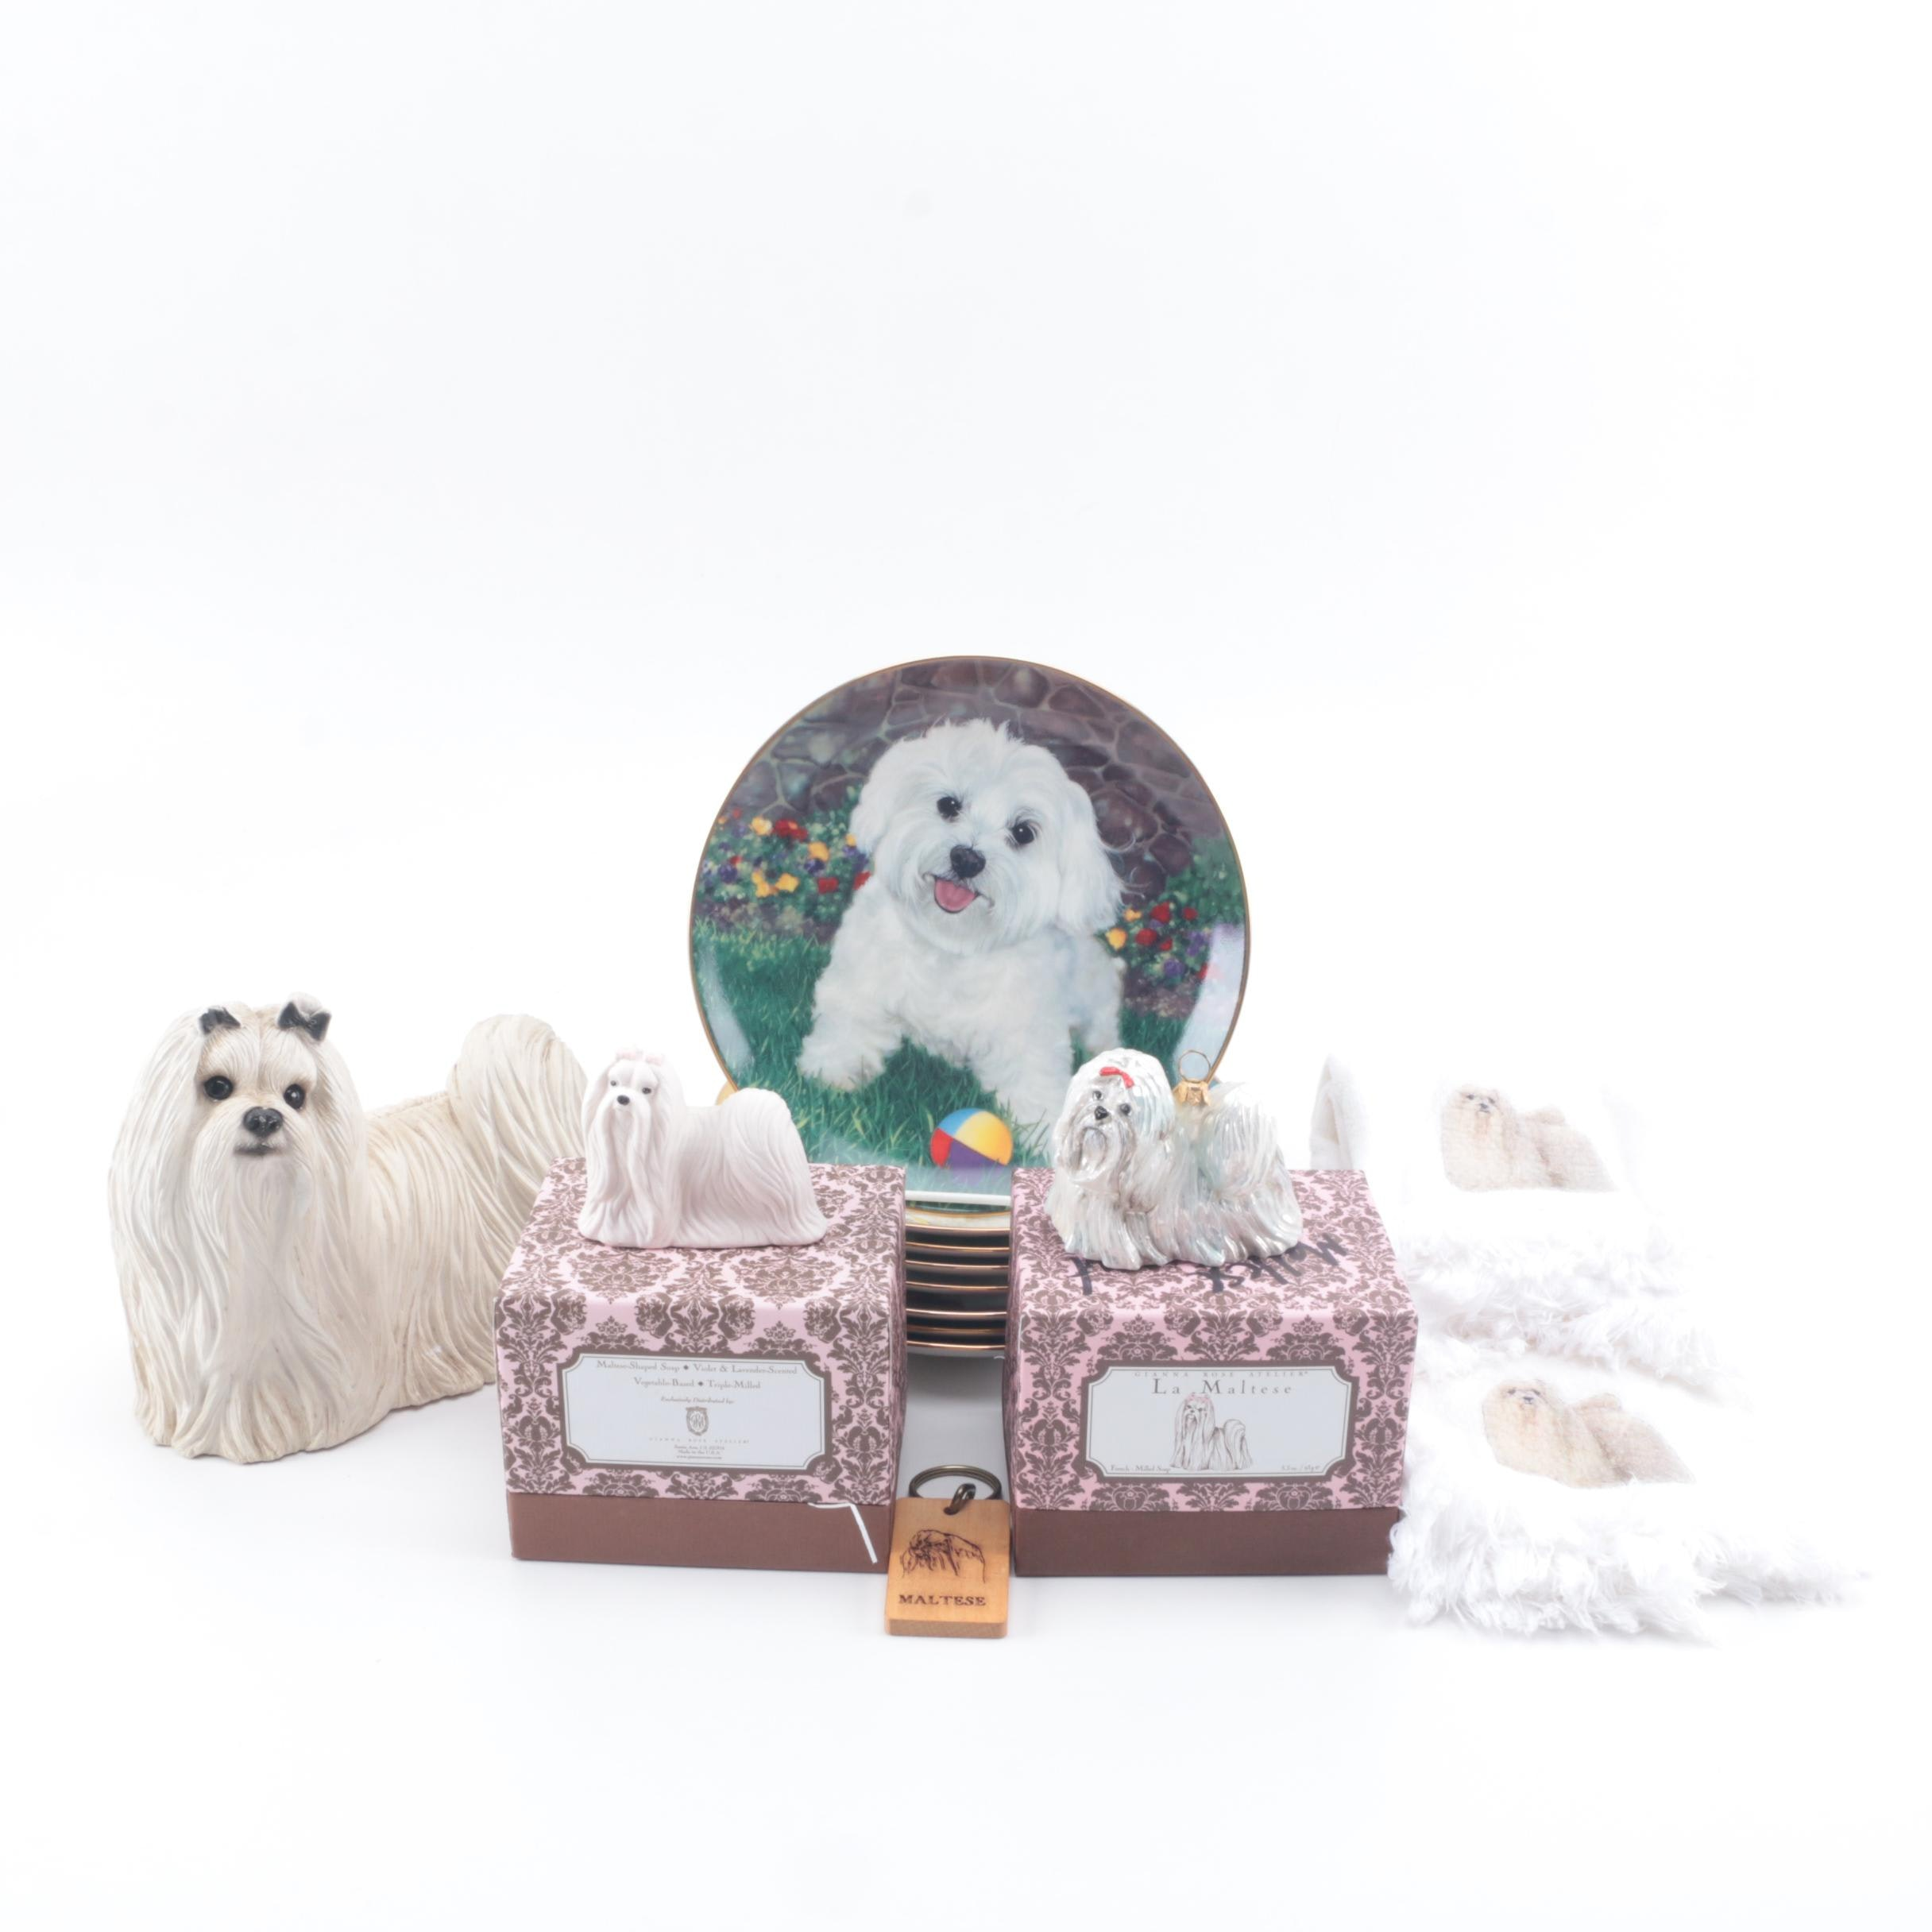 "Assortment of Danbury Mint ""Maltese"" Decorative Plates and Decor"